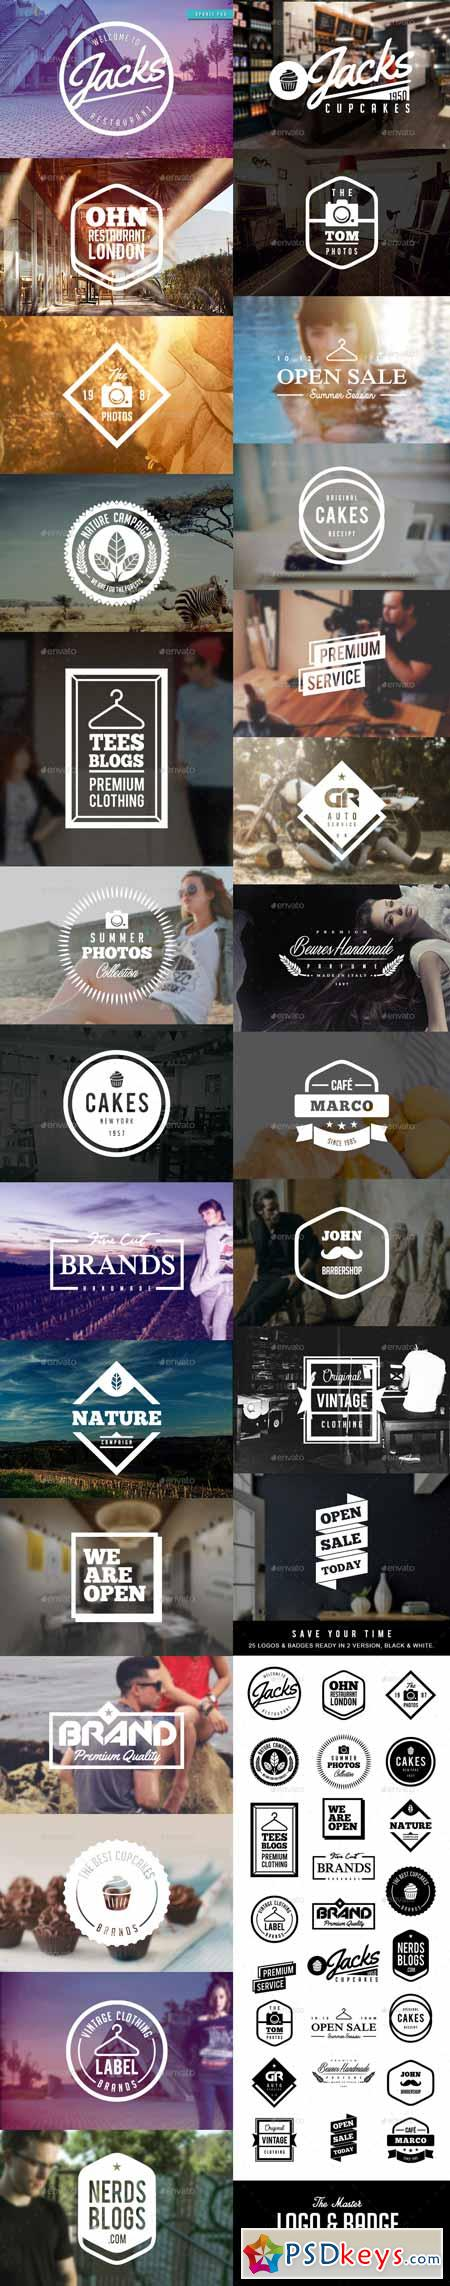 25 Logos and Badges Vol. 1 12271735